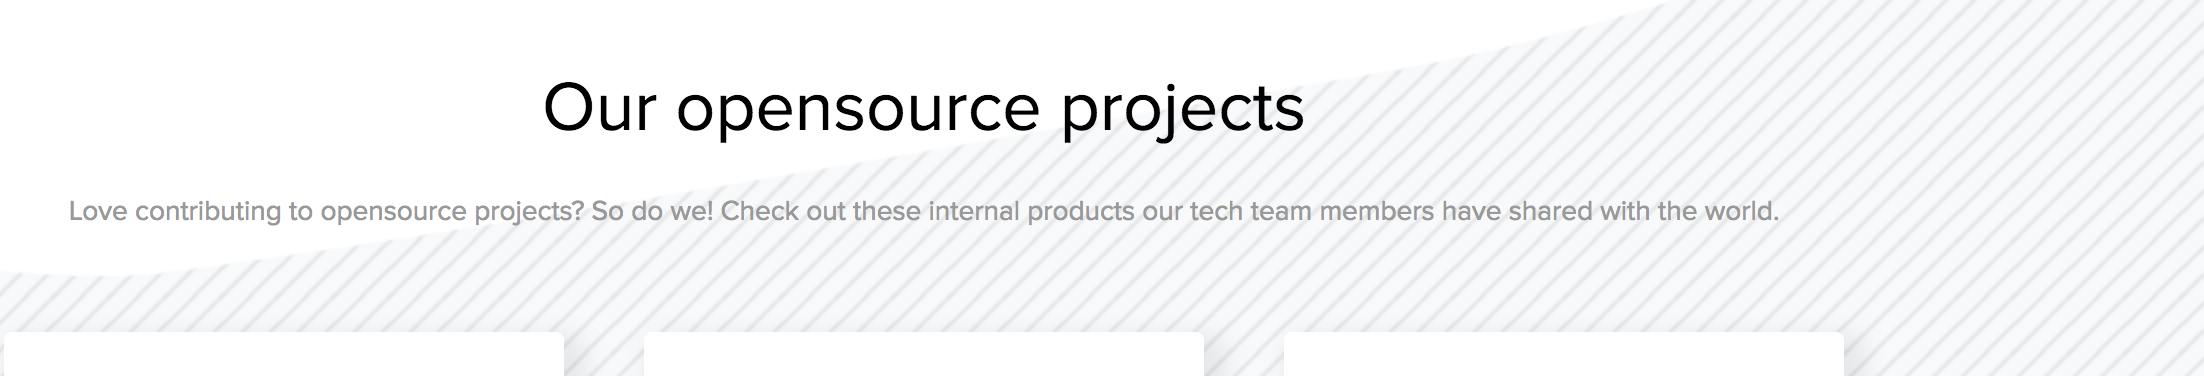 QA issues new website · Issue #1 · honeypotio/website · GitHub